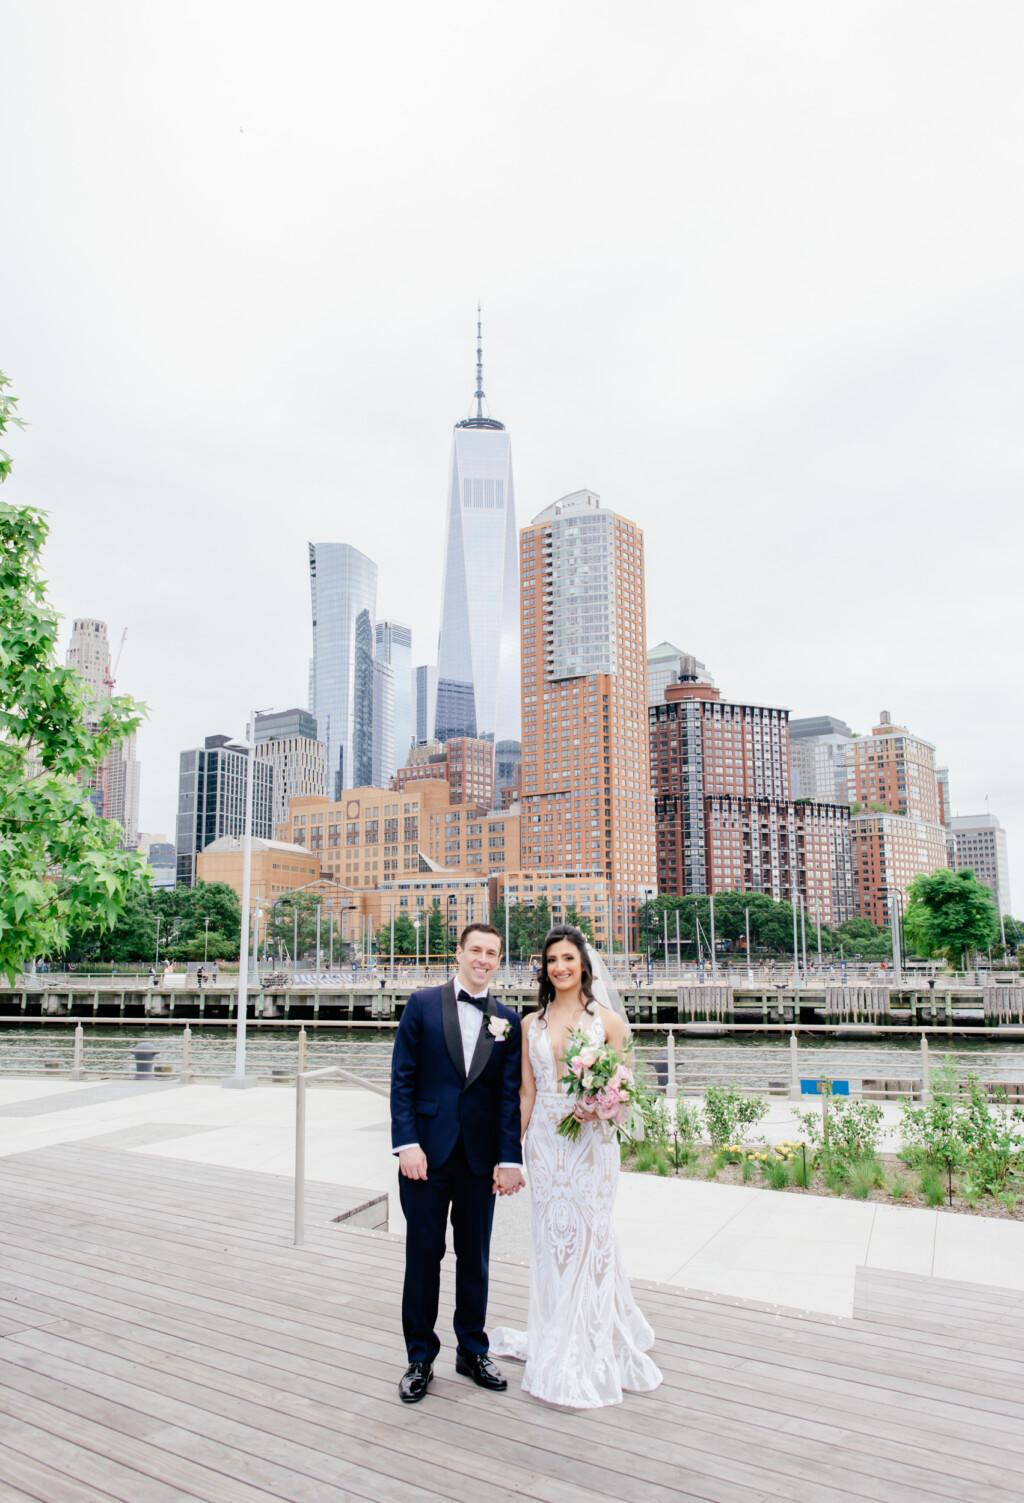 MarissaEric wedding USMag 55